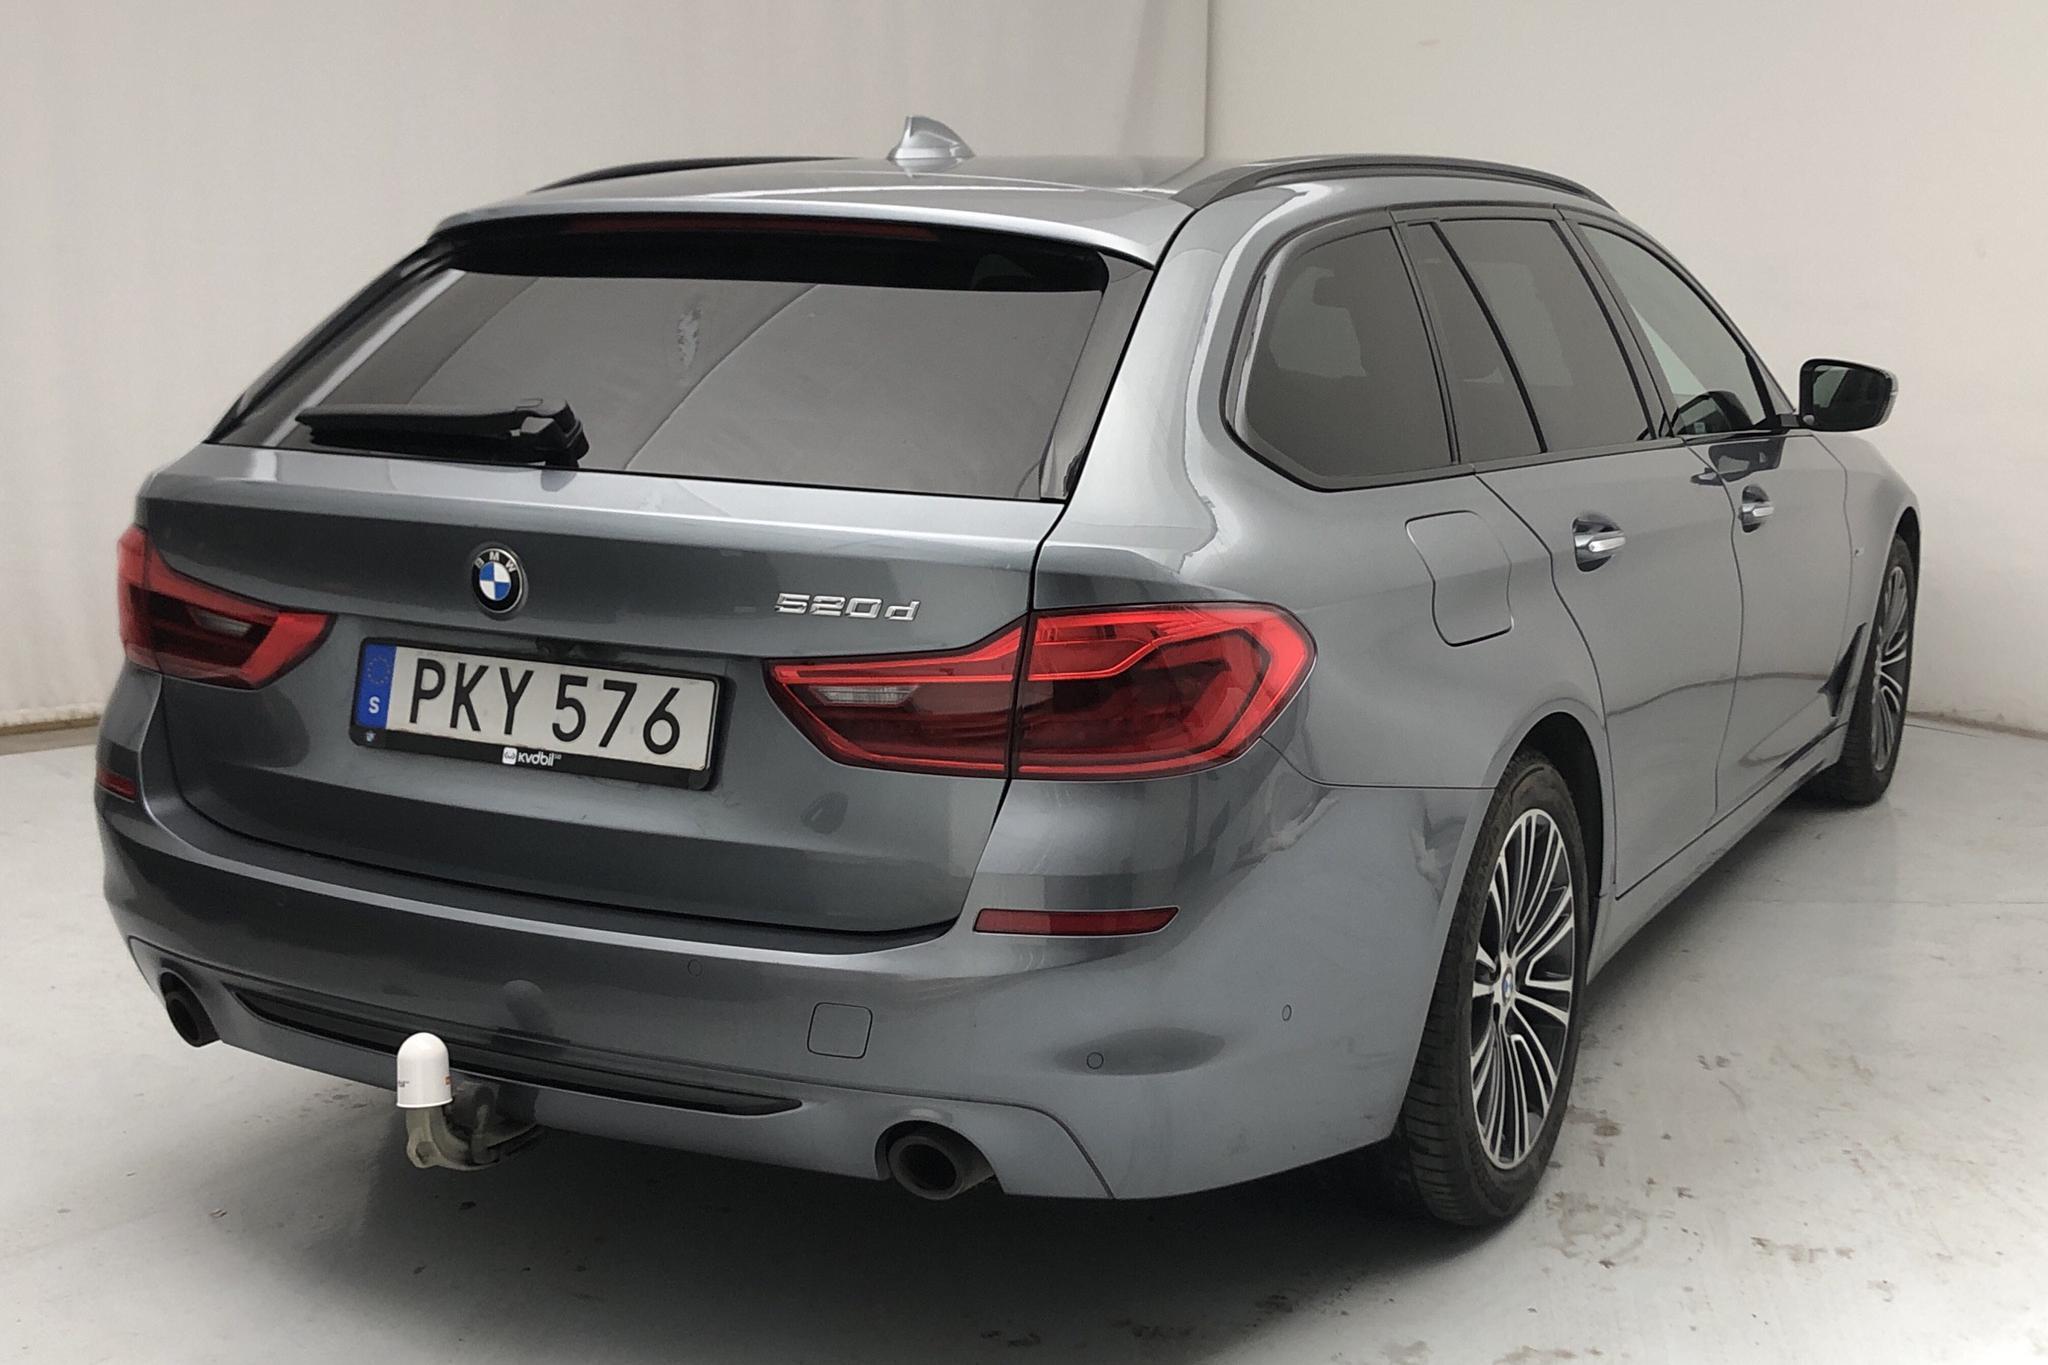 BMW 520d Touring, G31 (190hk) - 9 993 mil - Automat - blå - 2018